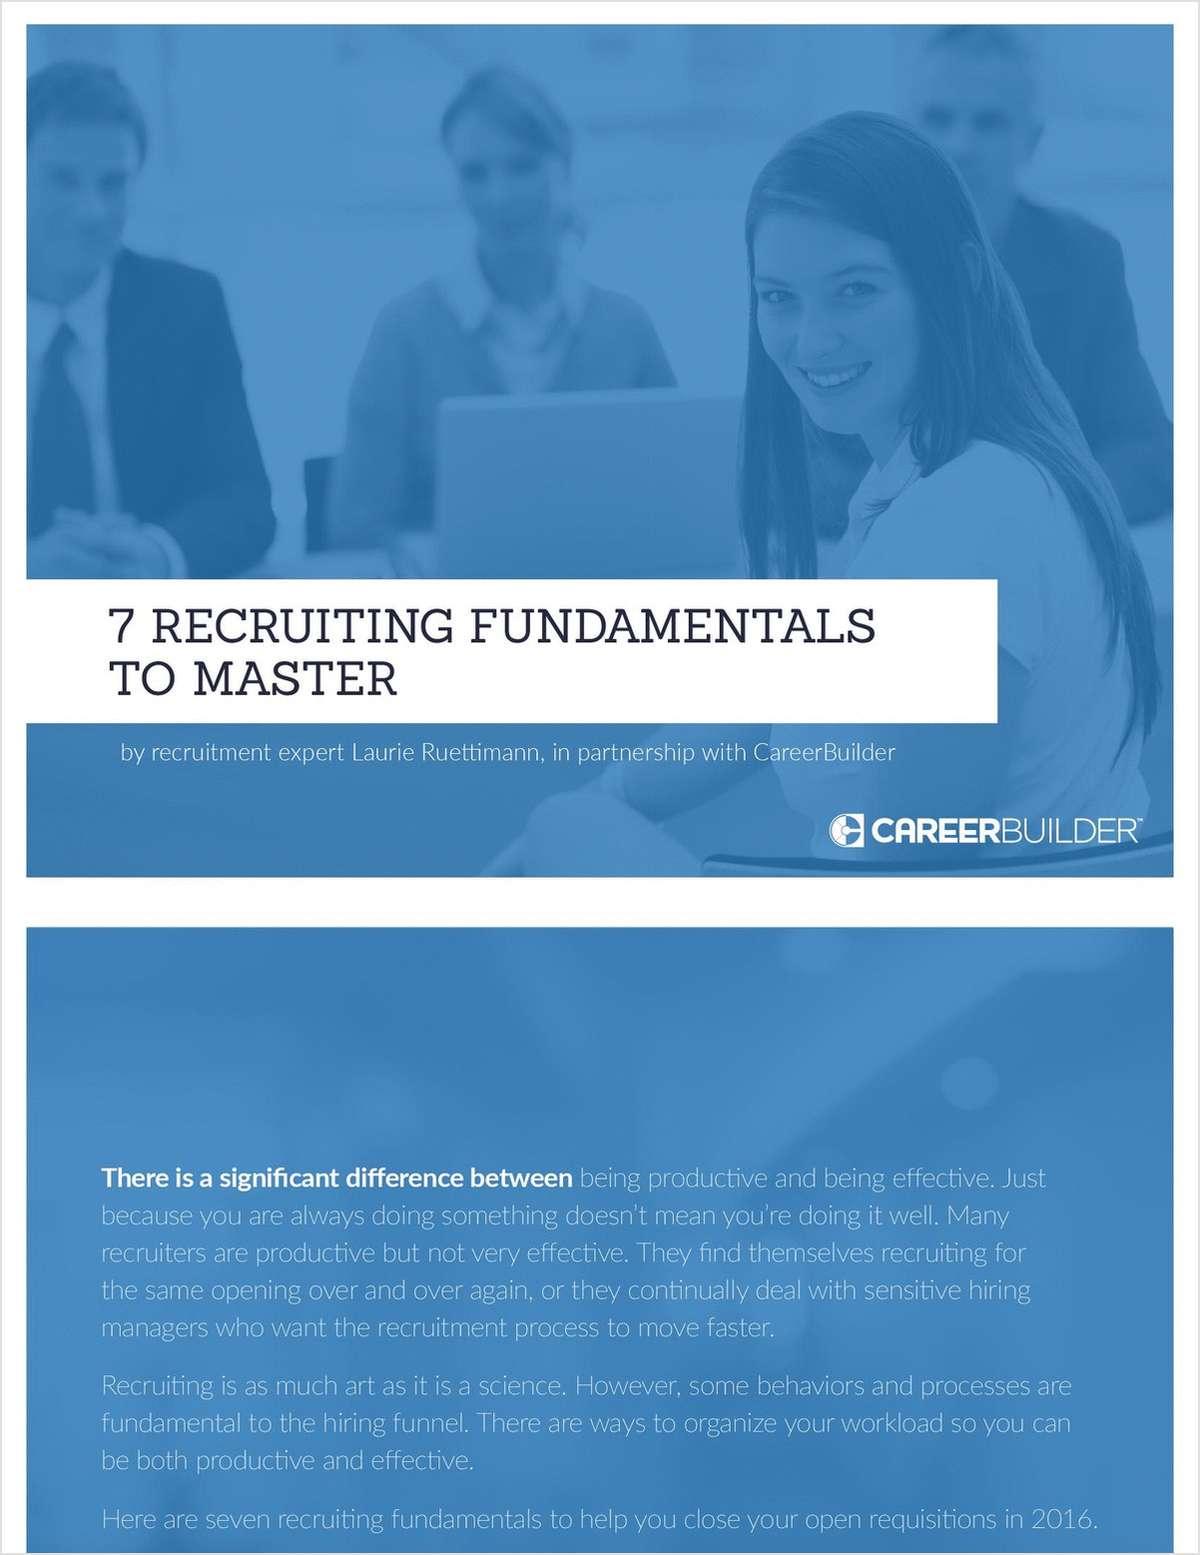 7 Recruitment Fundamentals to Master